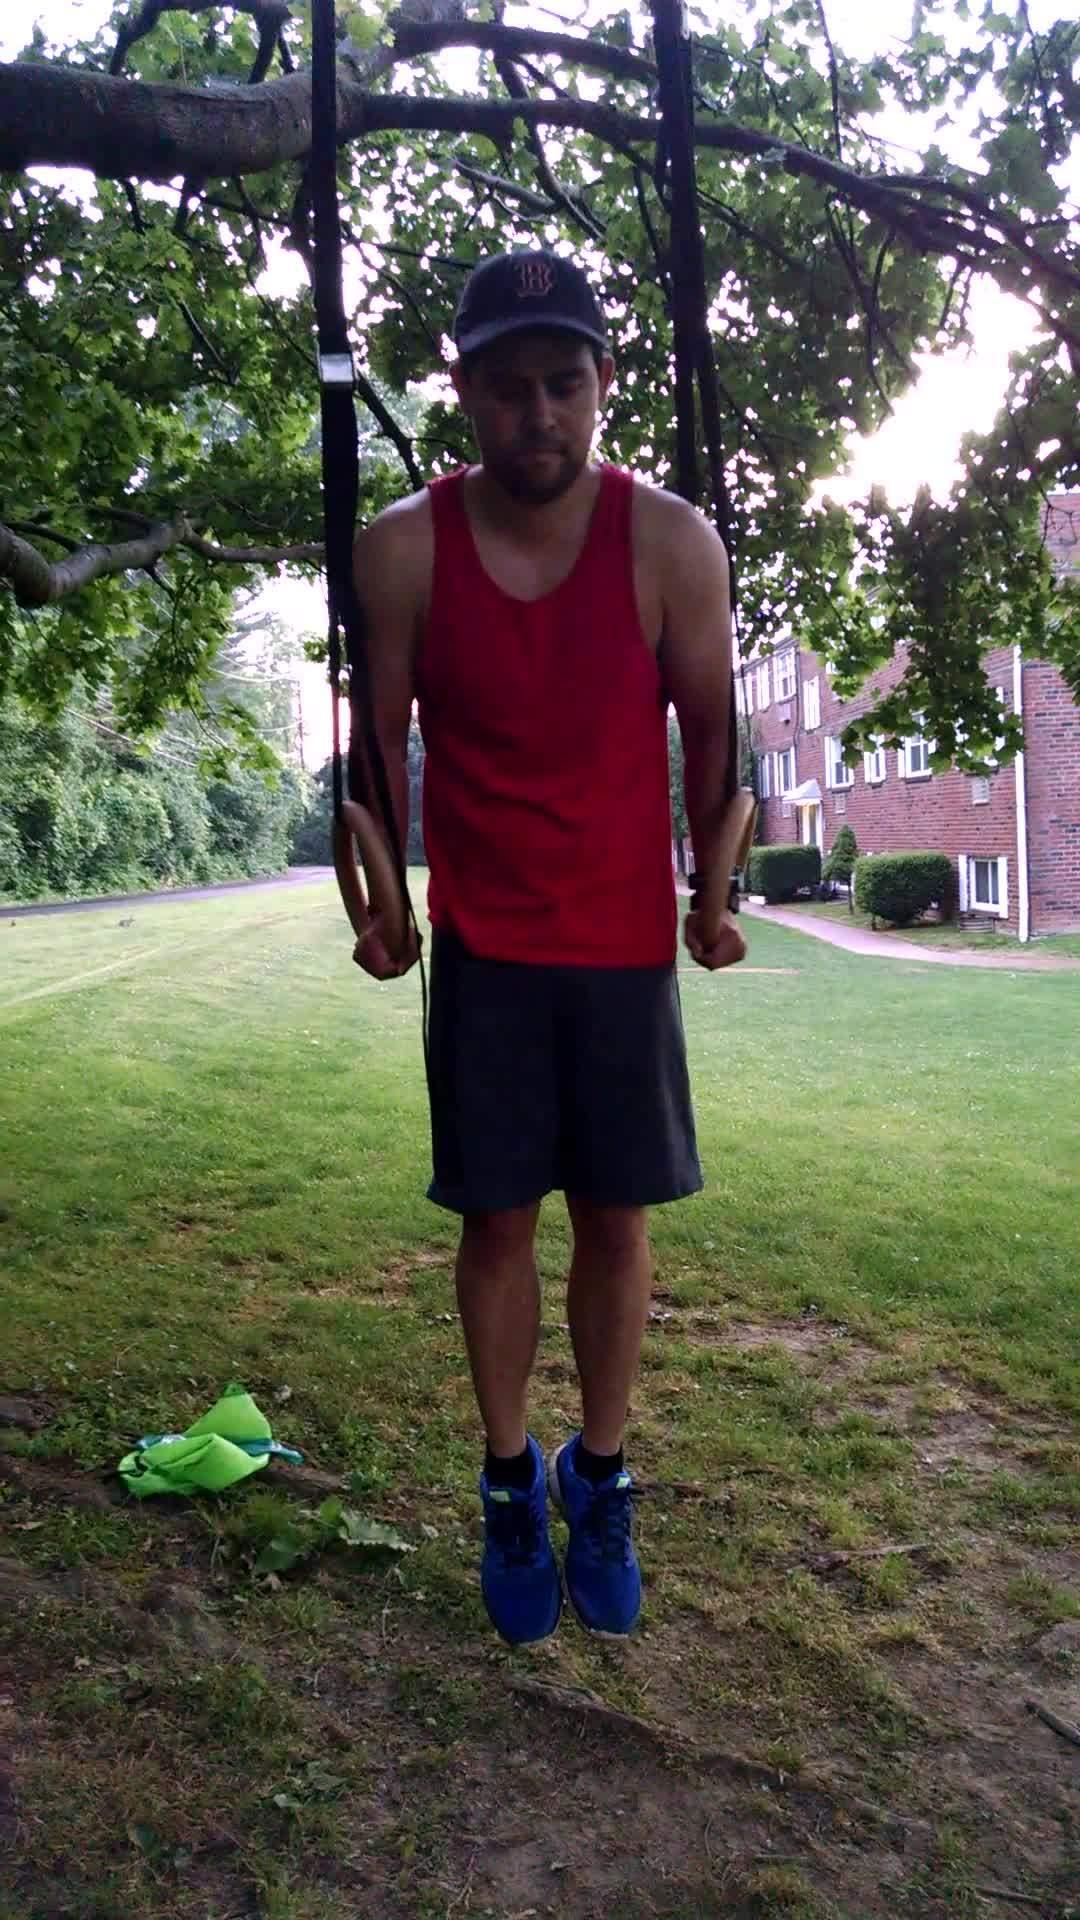 bodyweightfitness, Ring Dips GIFs